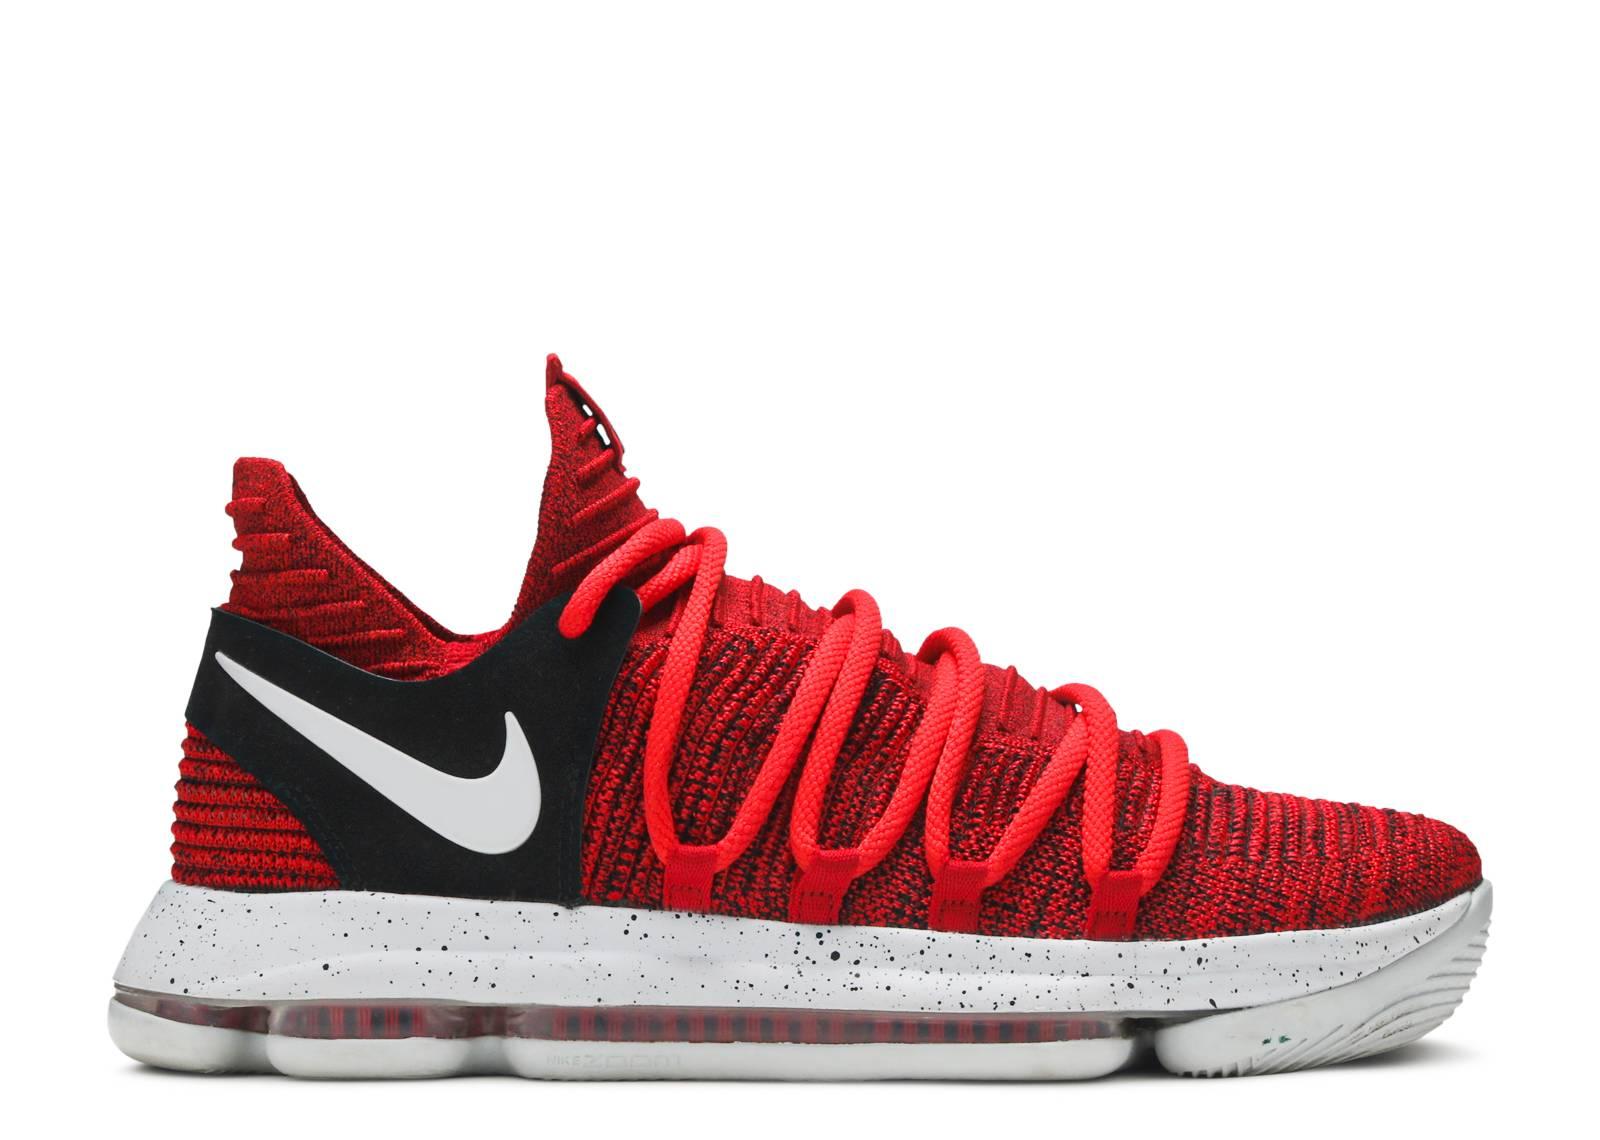 sale retailer 538f5 559cb Nike Zoom Kd10 - Nike - 897815 600 - university red pure platinum ...